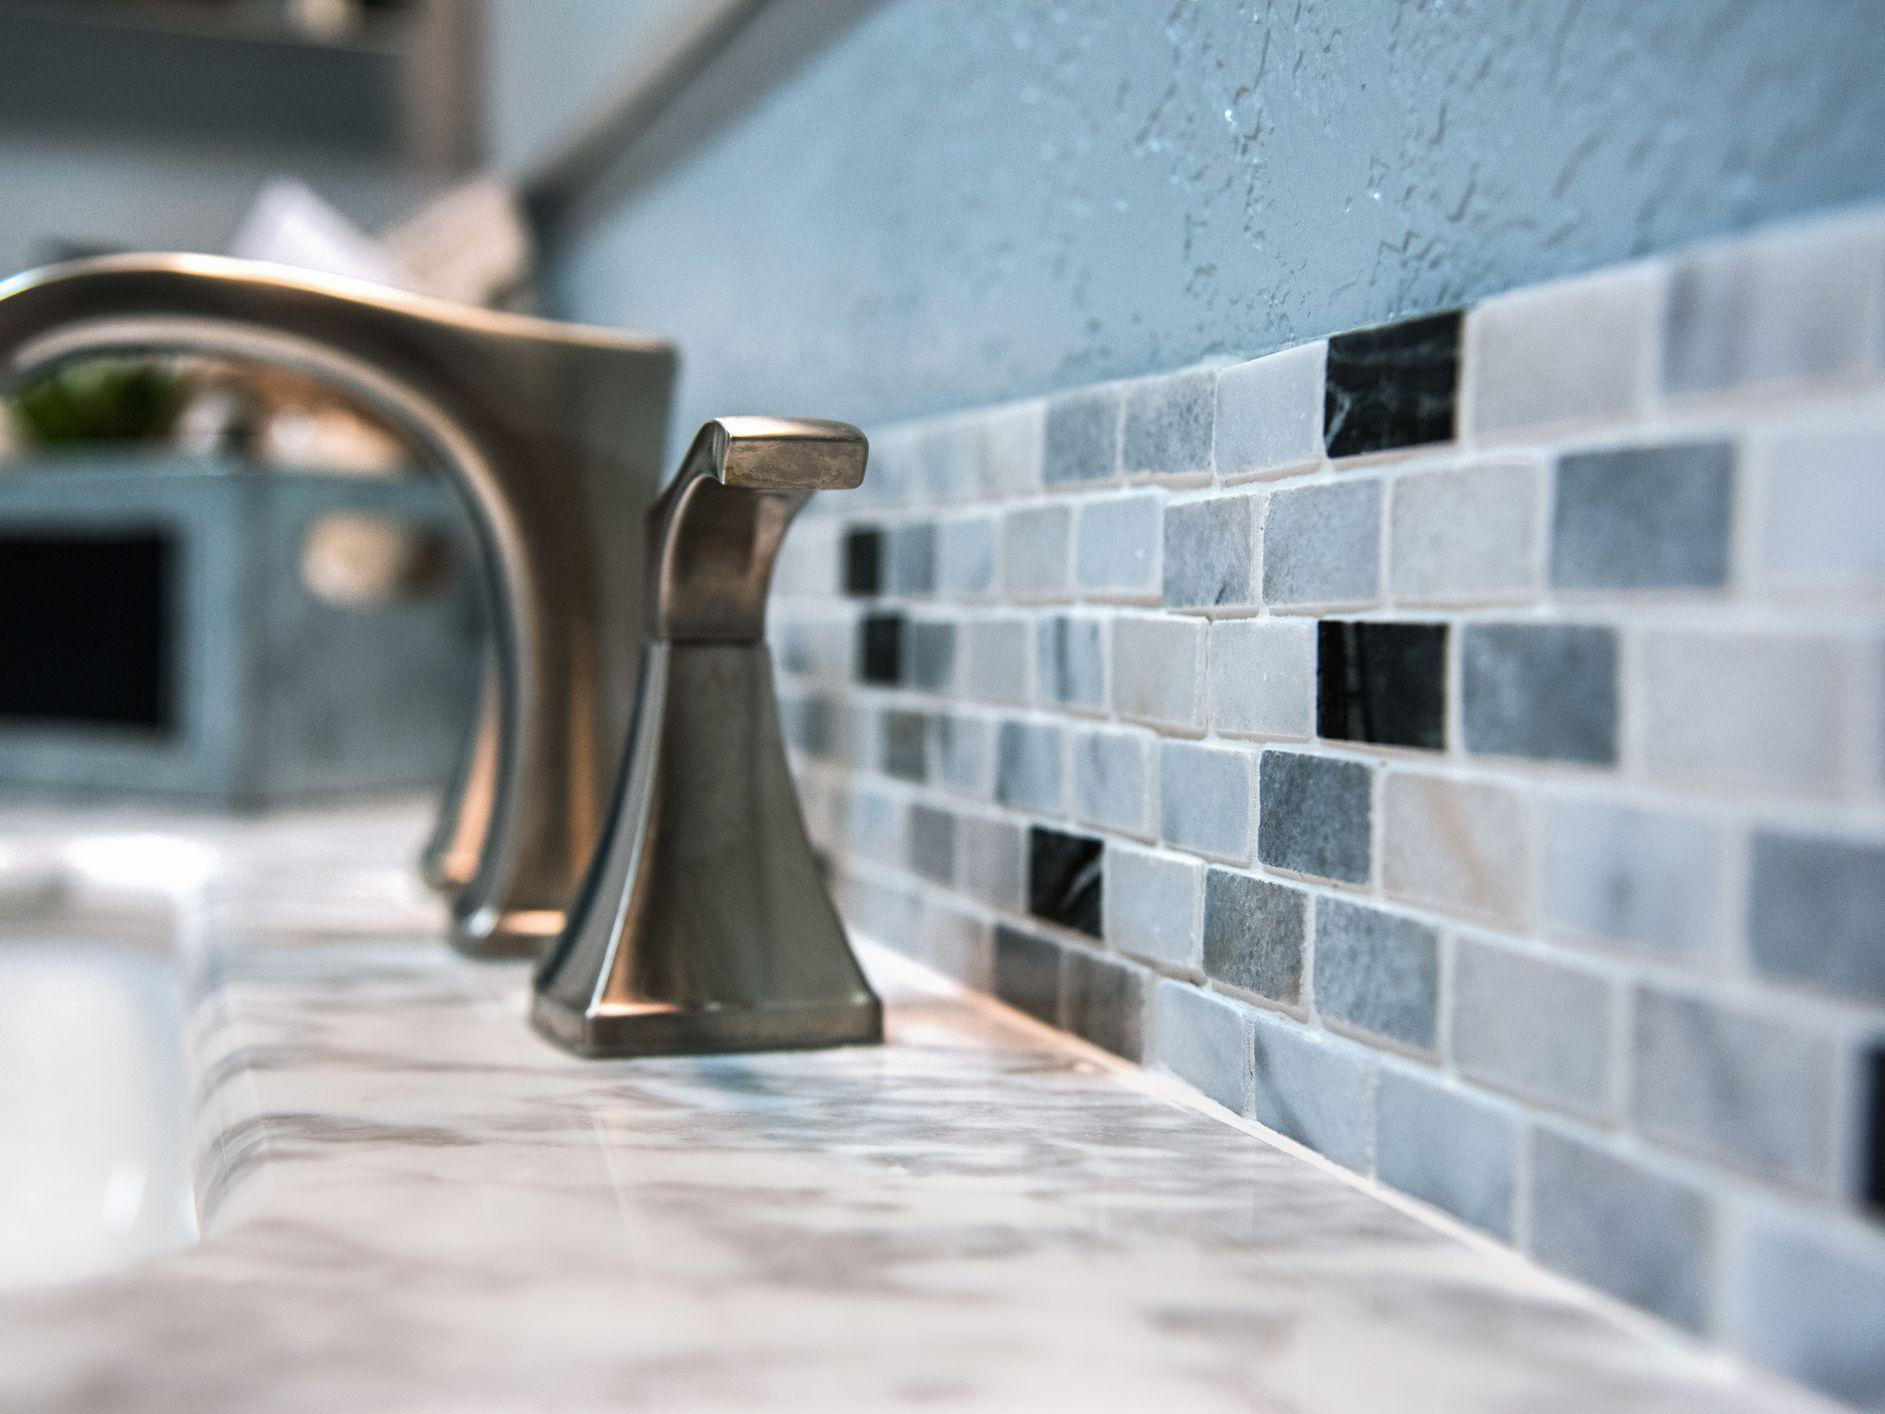 kitchen and bathroom backsplashes guide